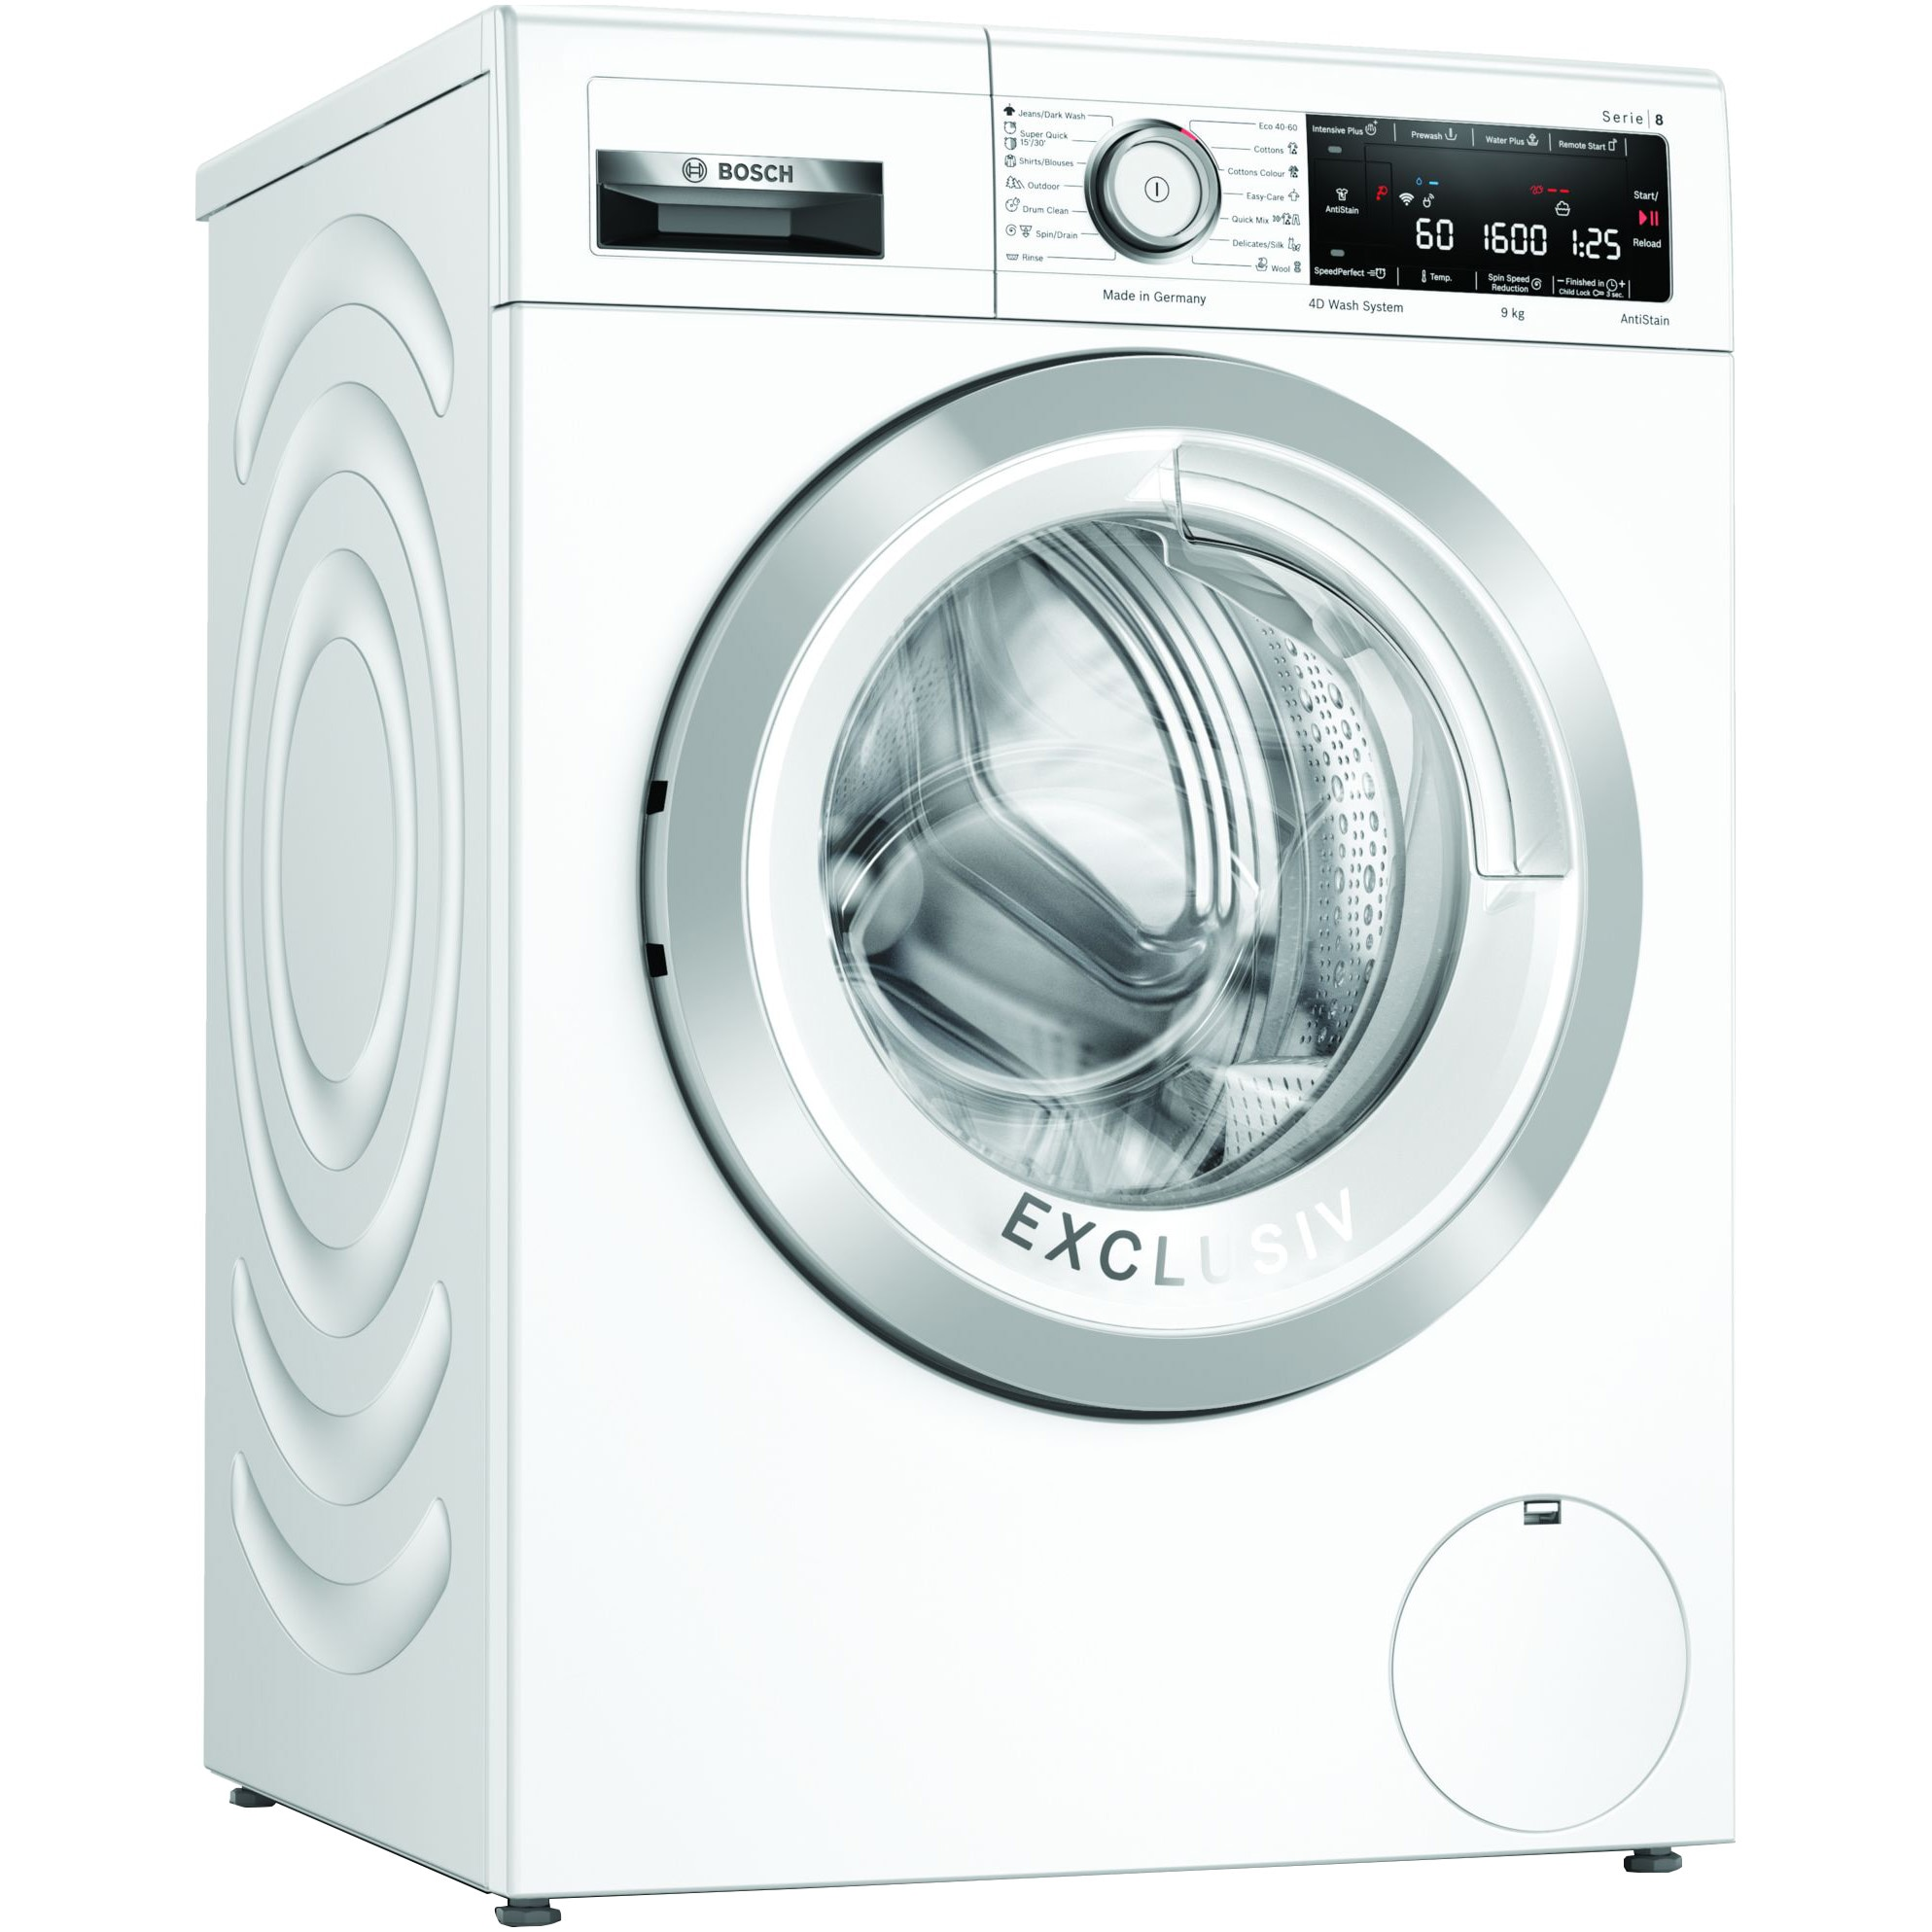 Fotografie Masina de spalat rufe Bosch WAX32MH0BY, 9 kg, 1600 RPM, Clasa C, Home Connect, EcoSilence Drive, AntiPete, Super Quick 30, Alb